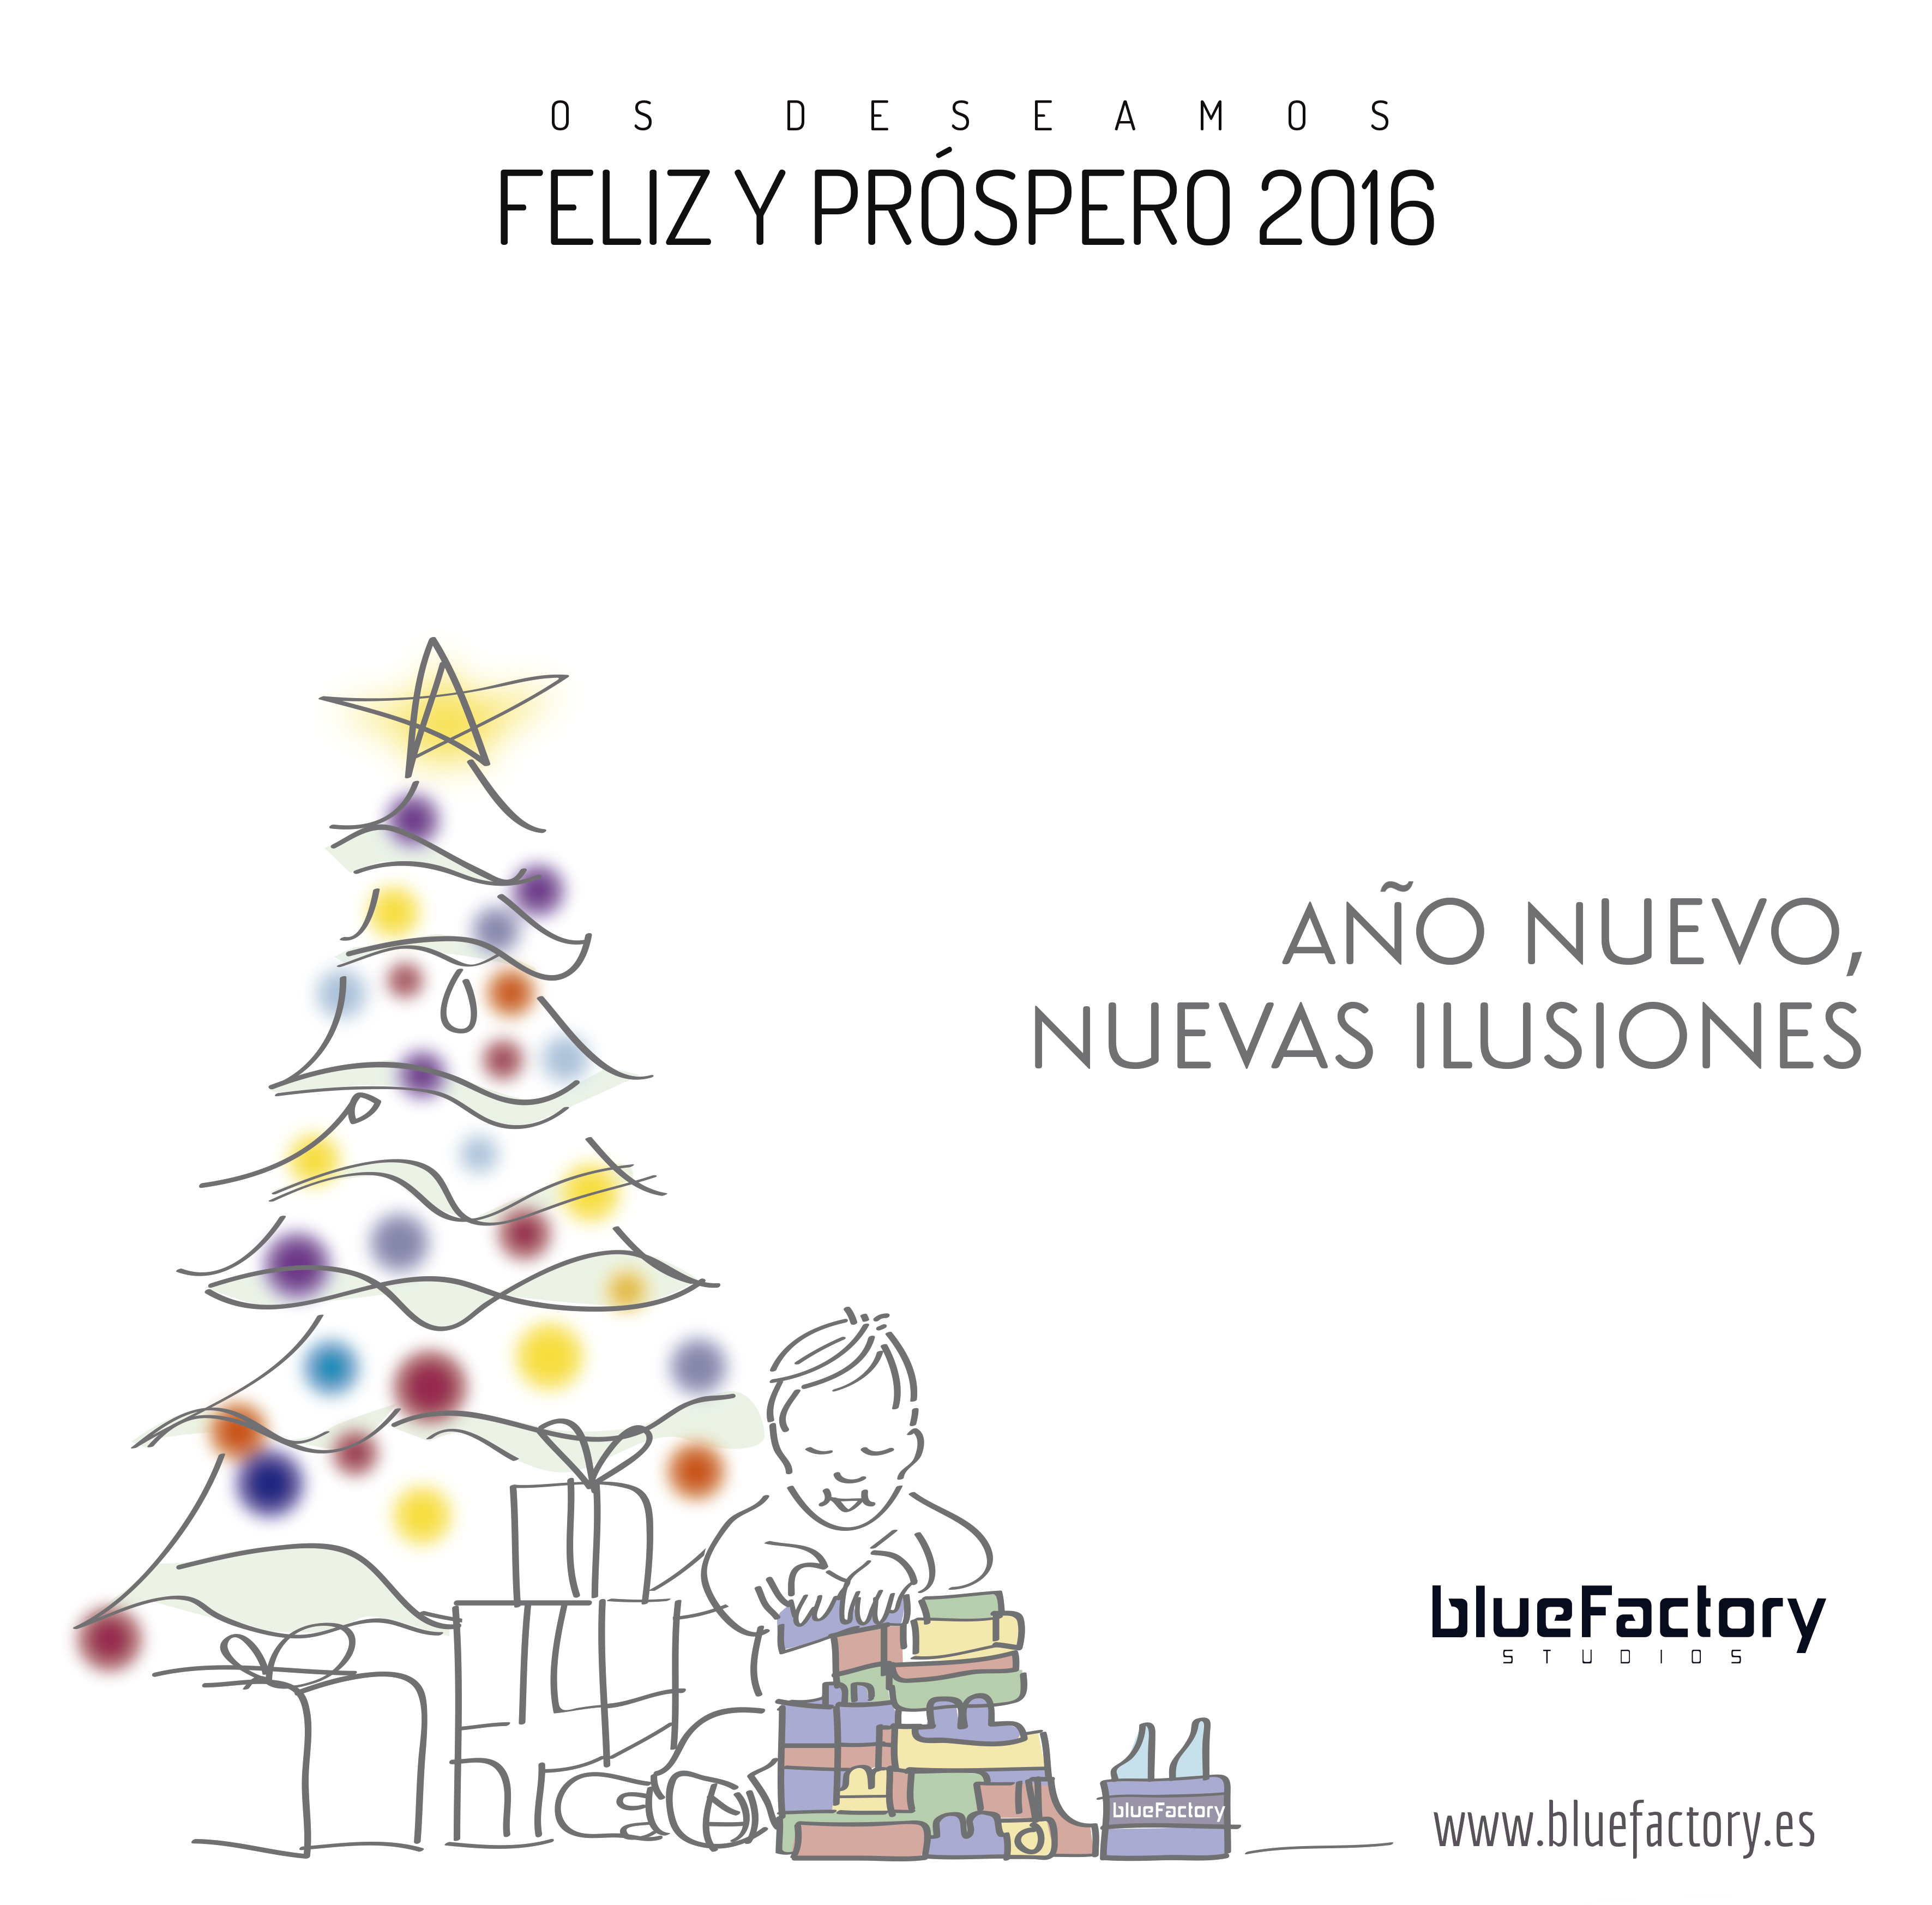 Bluefactory Studios les desea una feliz Navidad